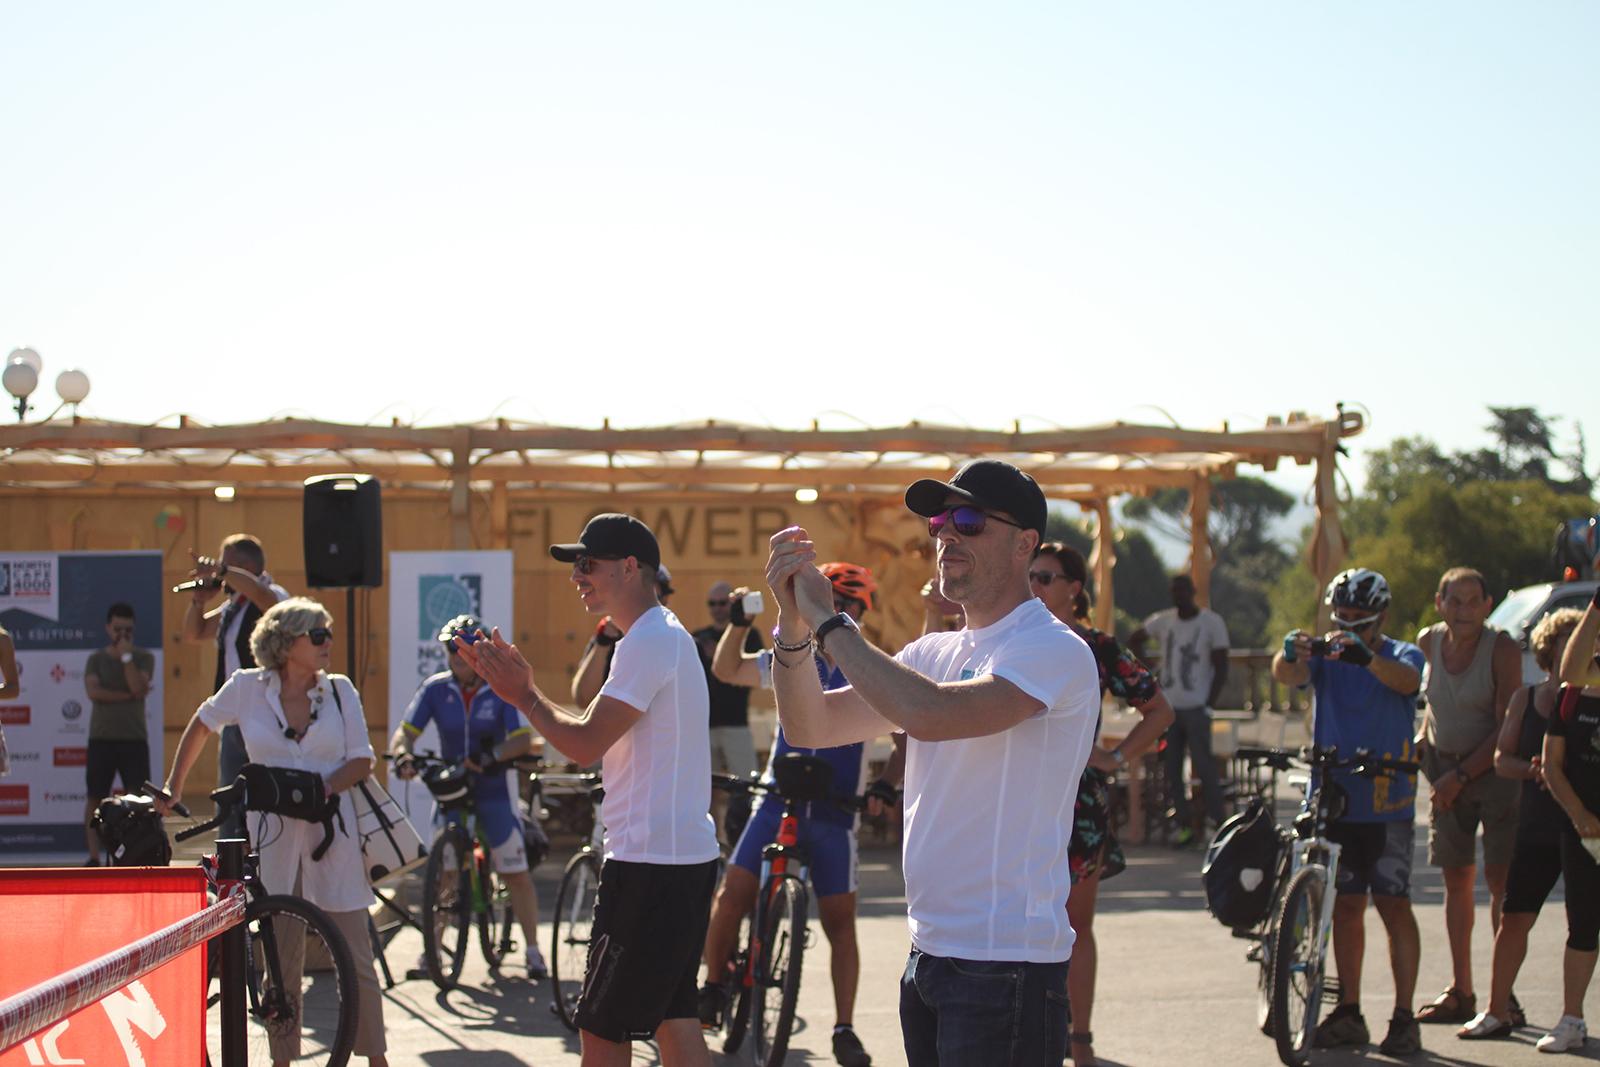 GRANDE_NORD_NC4K_bikepacking014